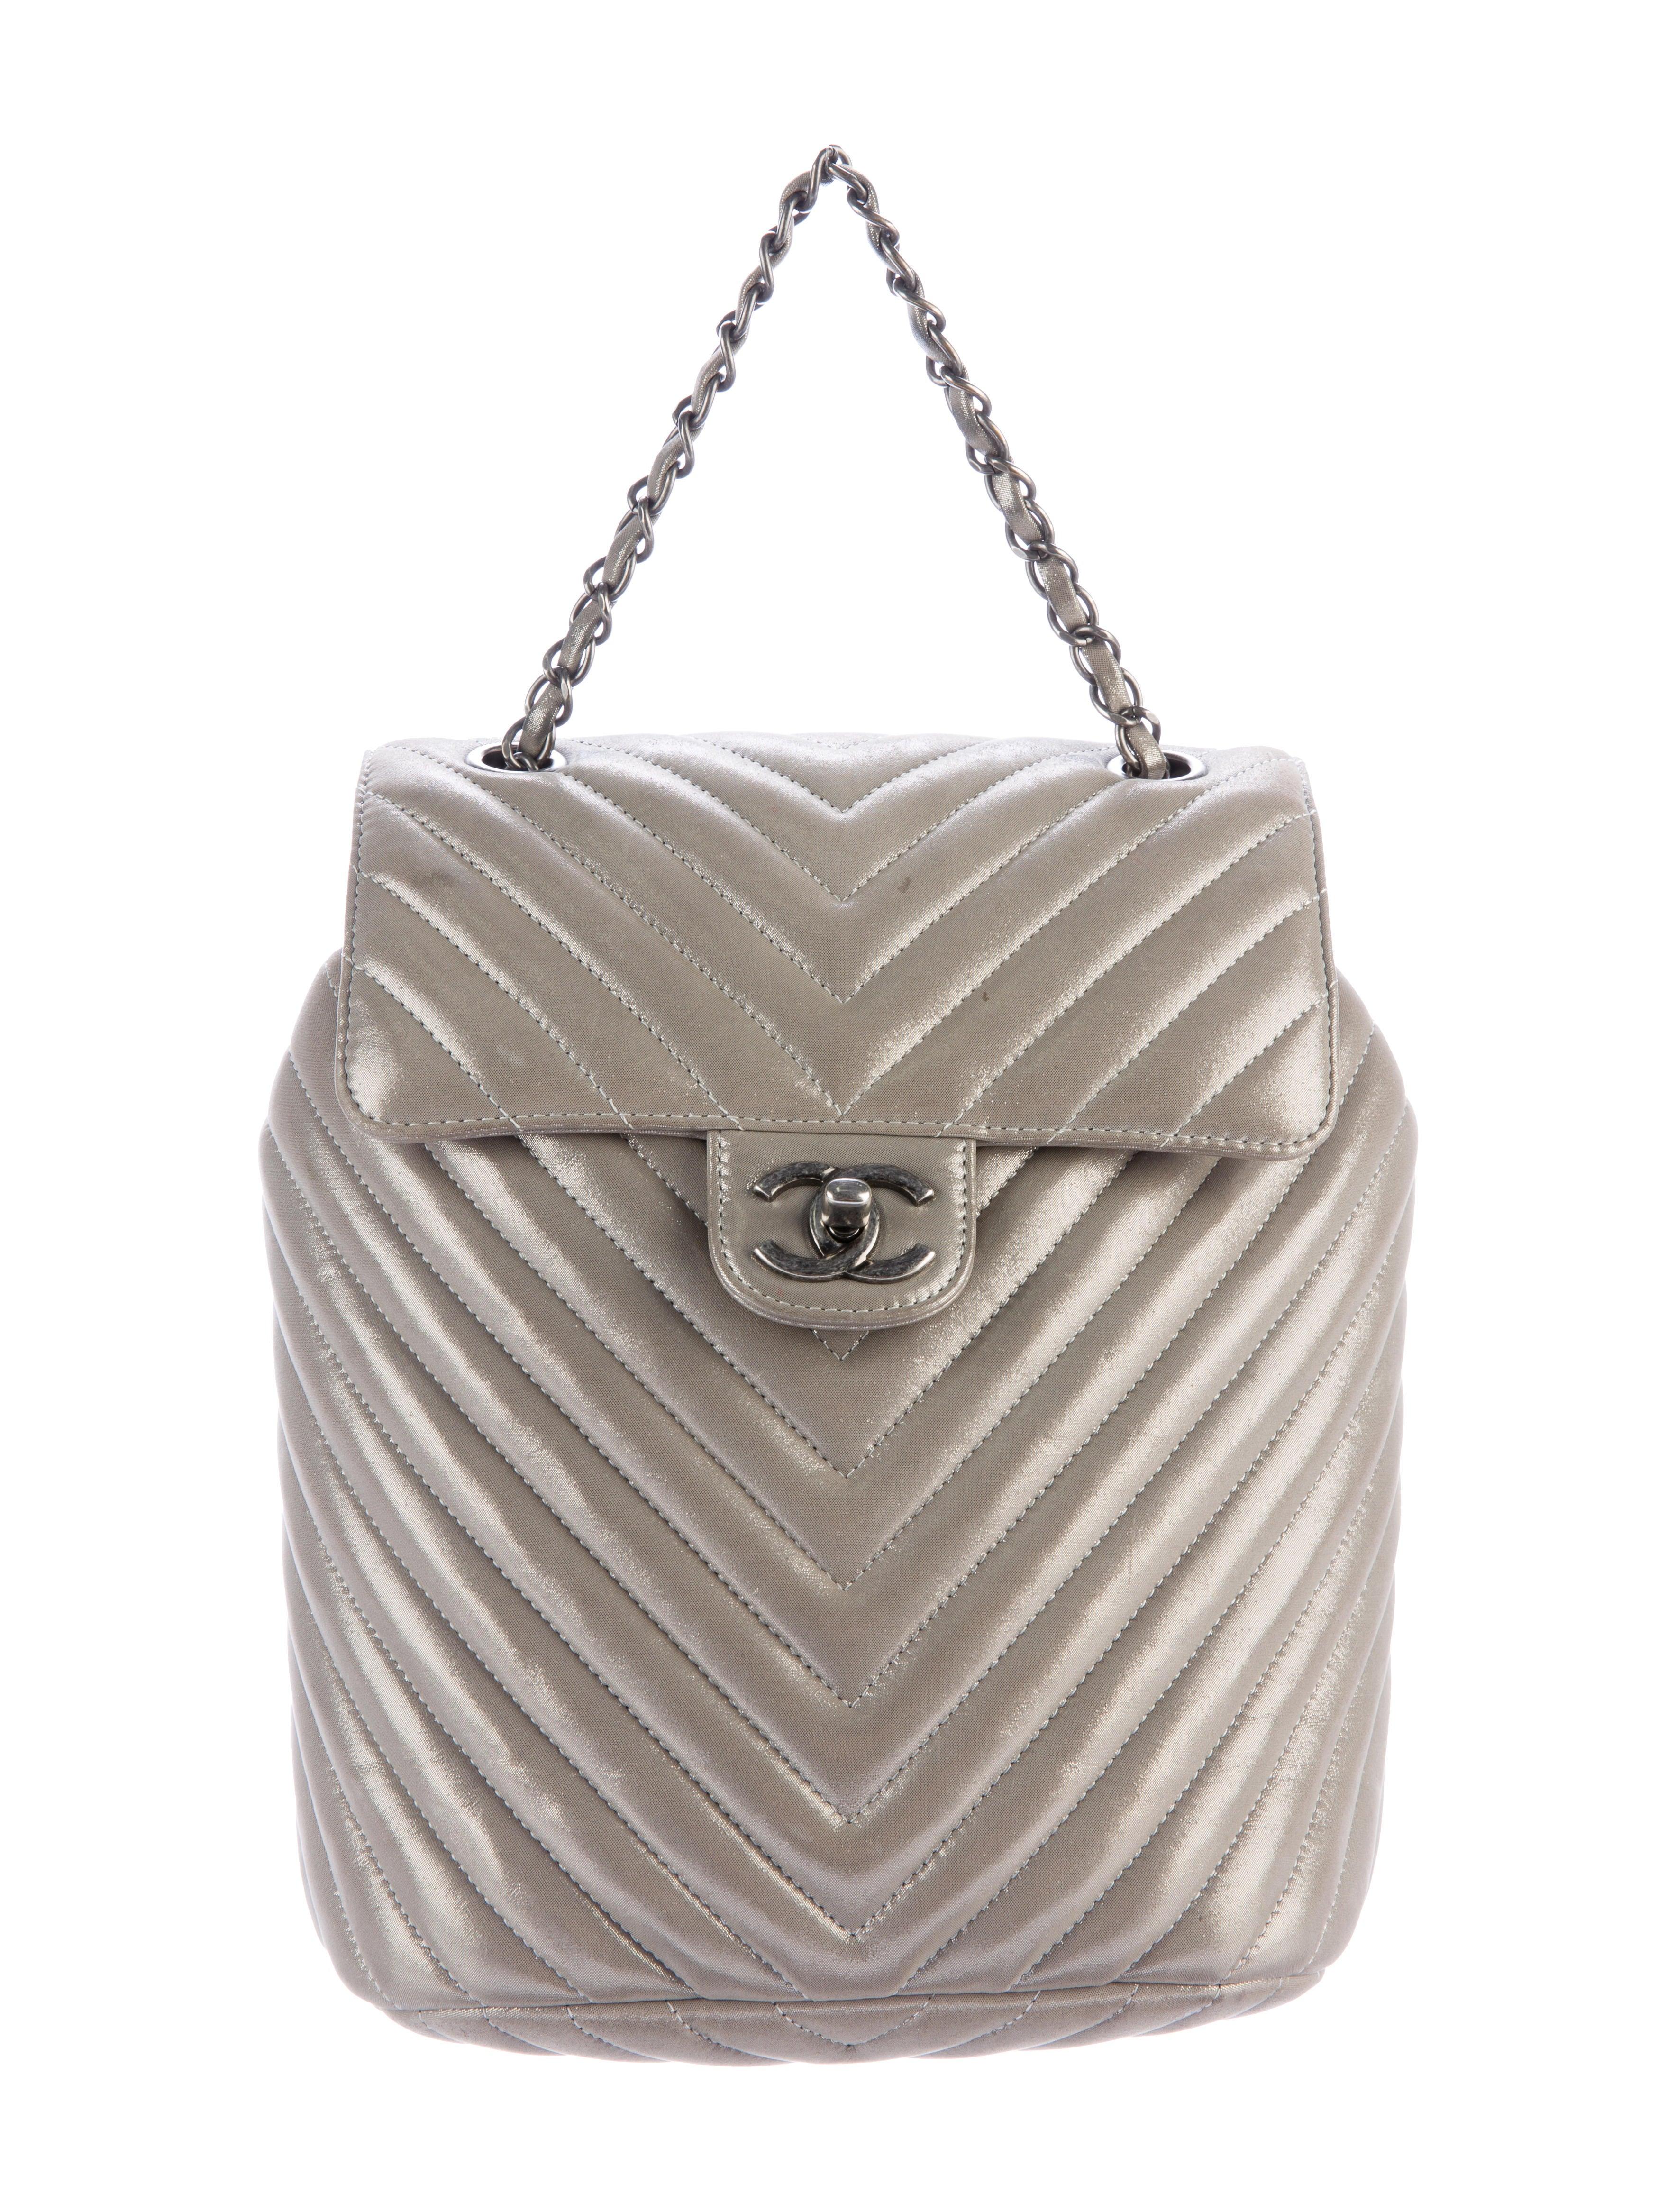 Chanel 2016 Chevron Urban Spirit Backpack - Handbags - CHA173211 ... 0f912517c3b68